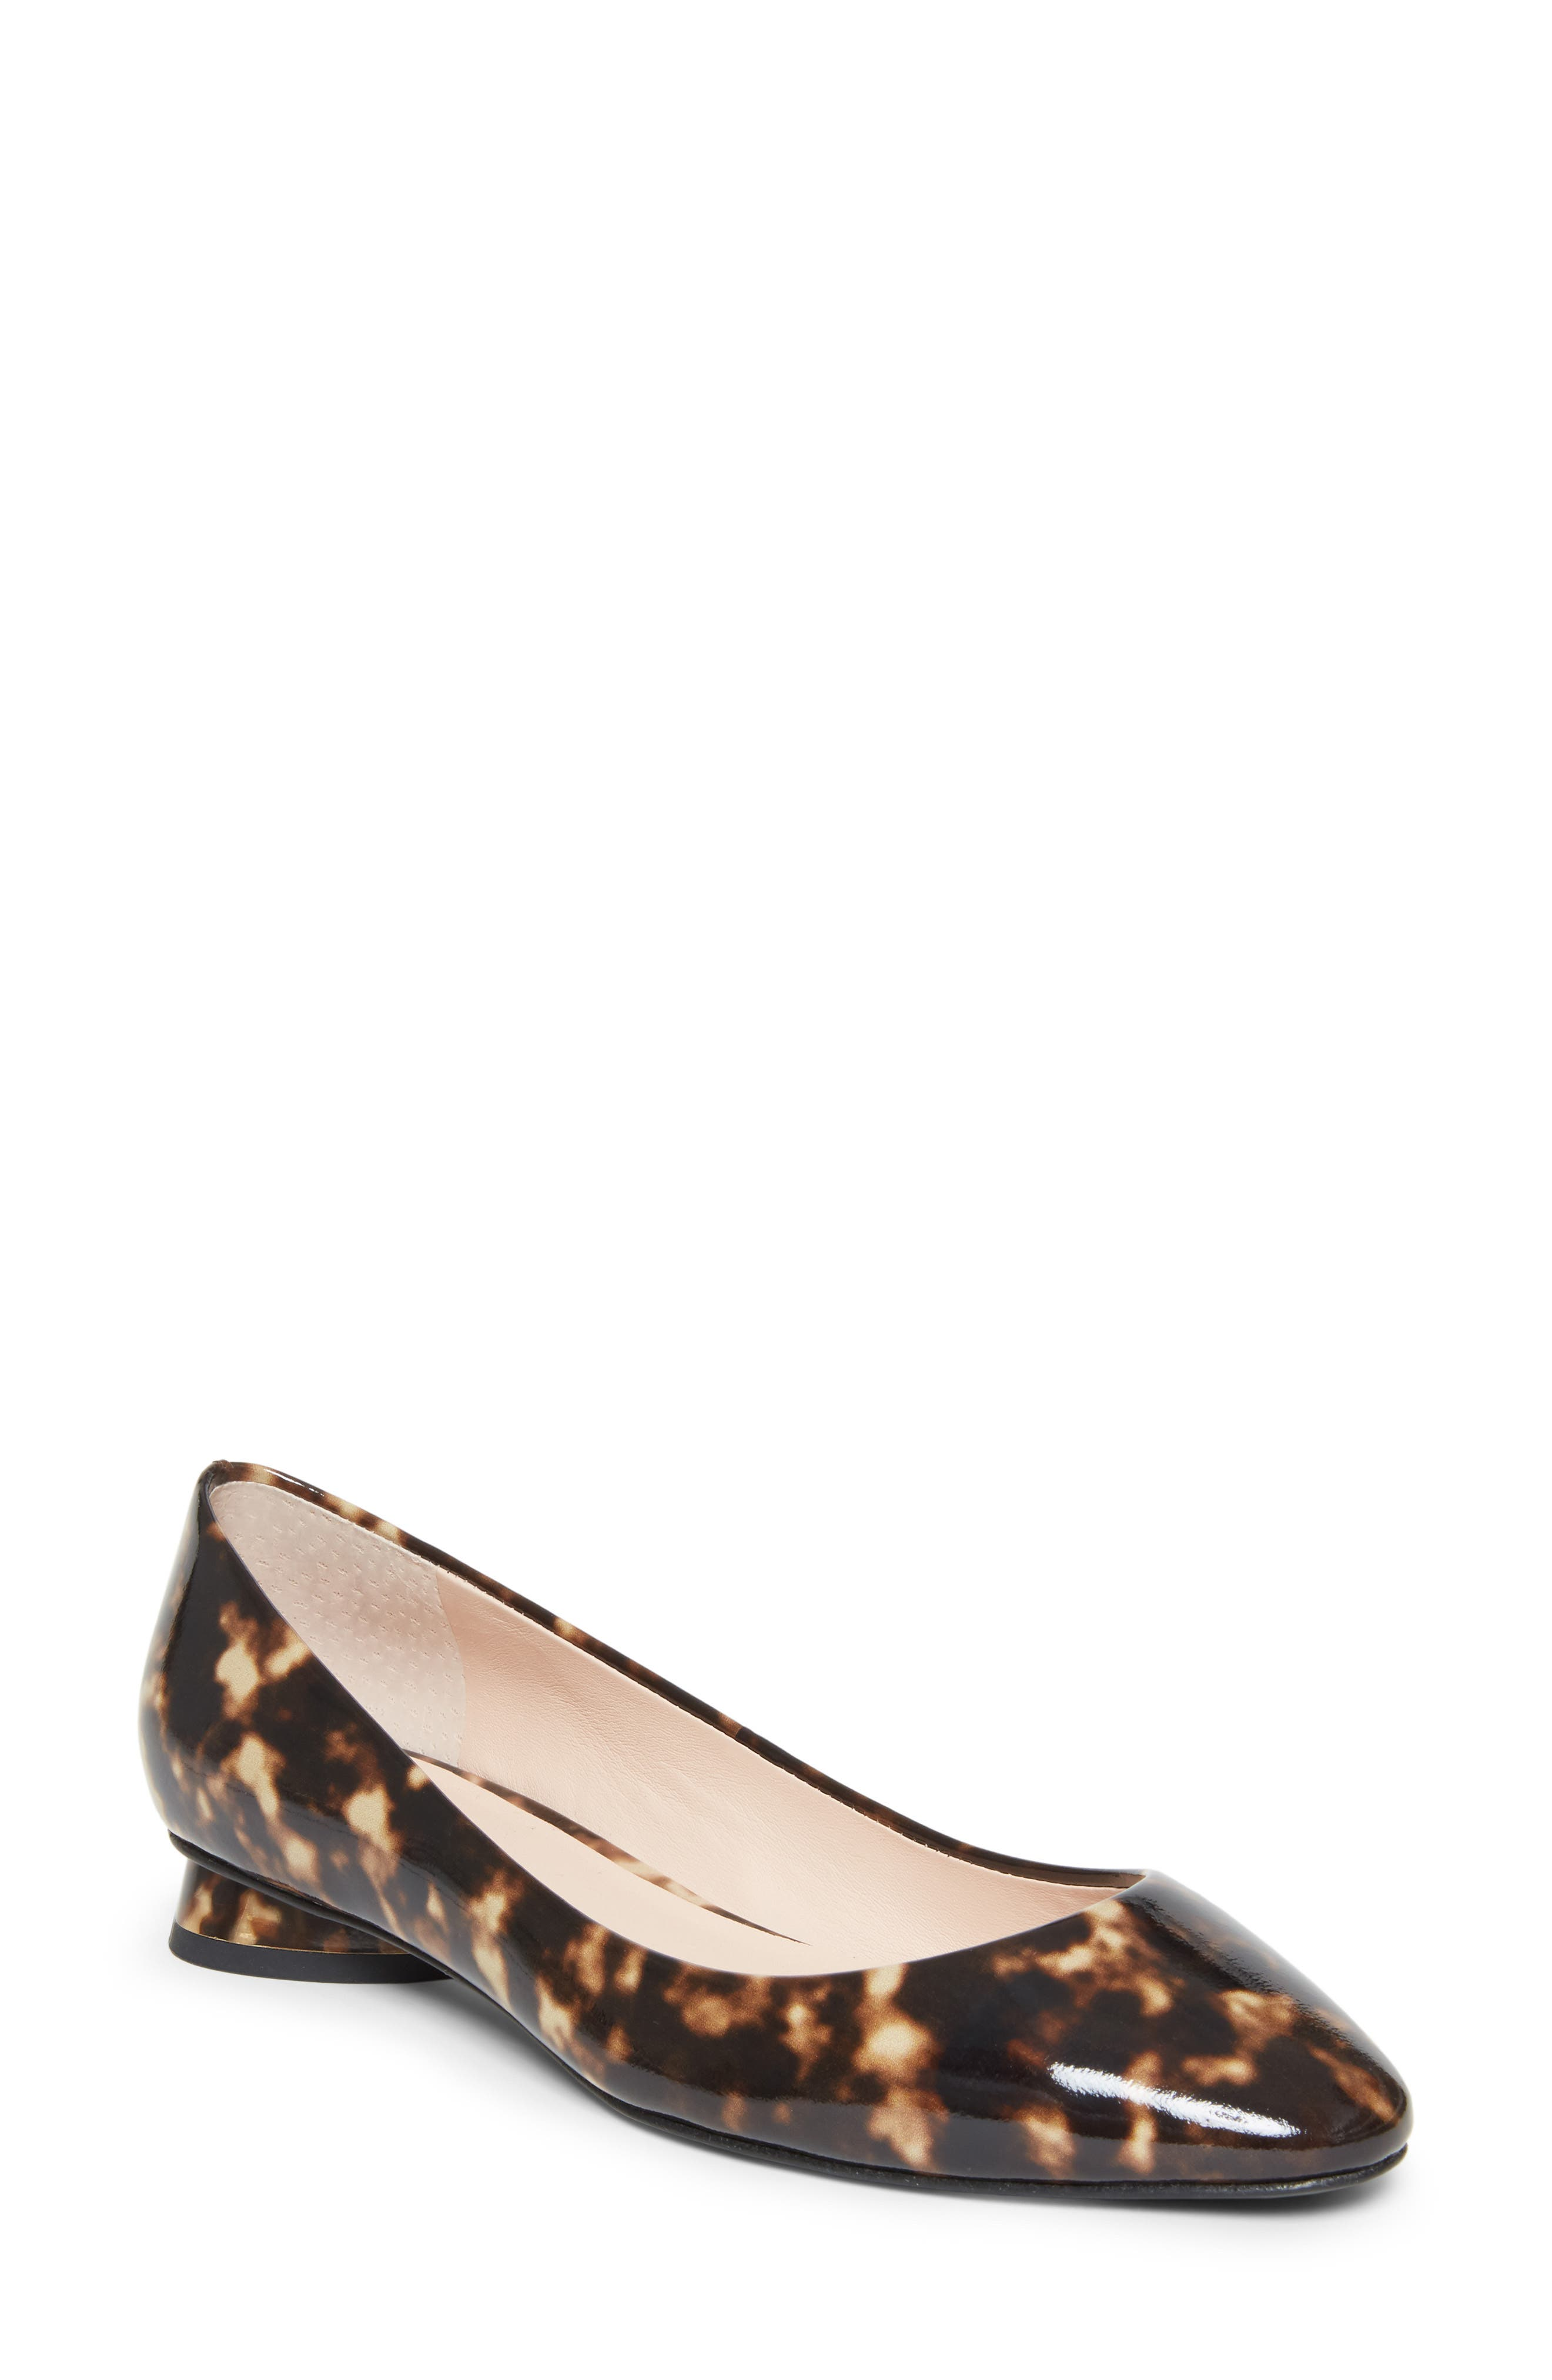 Kate Spade New York Fallyn Skimmer Flat- Brown